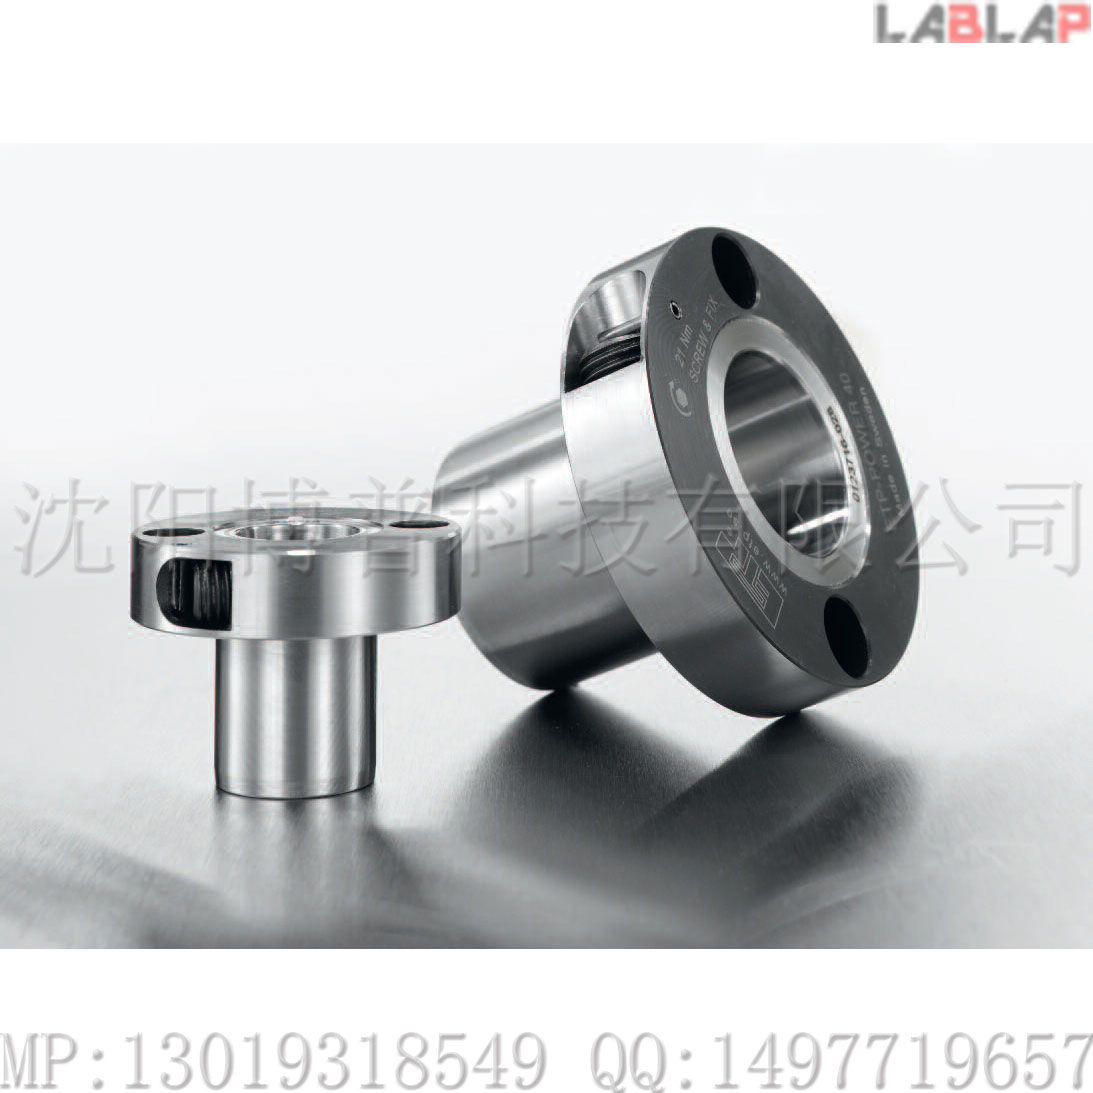 ETP液压胀套,,ETP-CLASSIC 60,ETP-A-60三木液压胀紧套,免键轴套